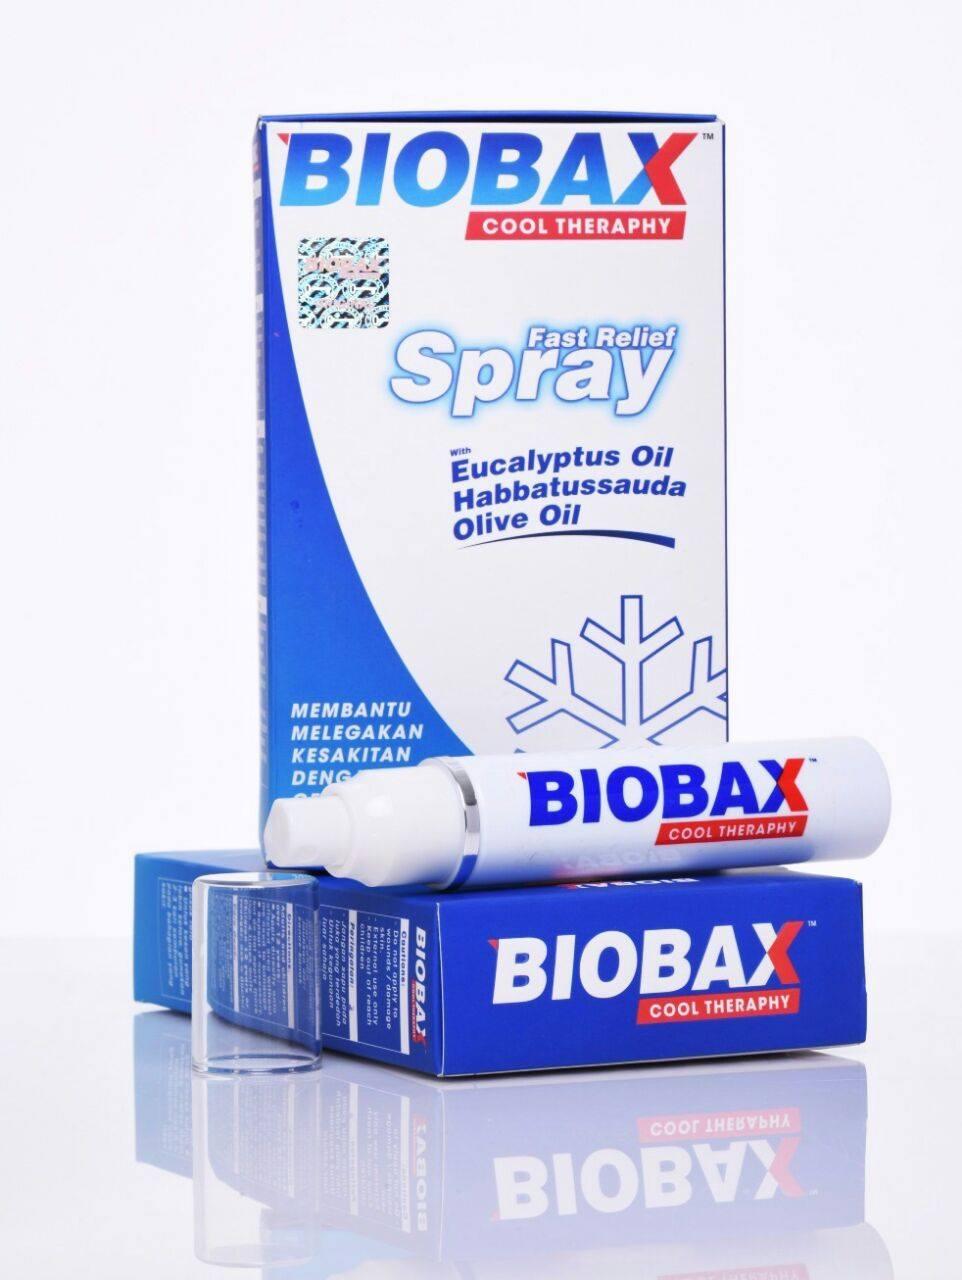 Kelebihan dan Kegunaan Biobax Cool Theraphy